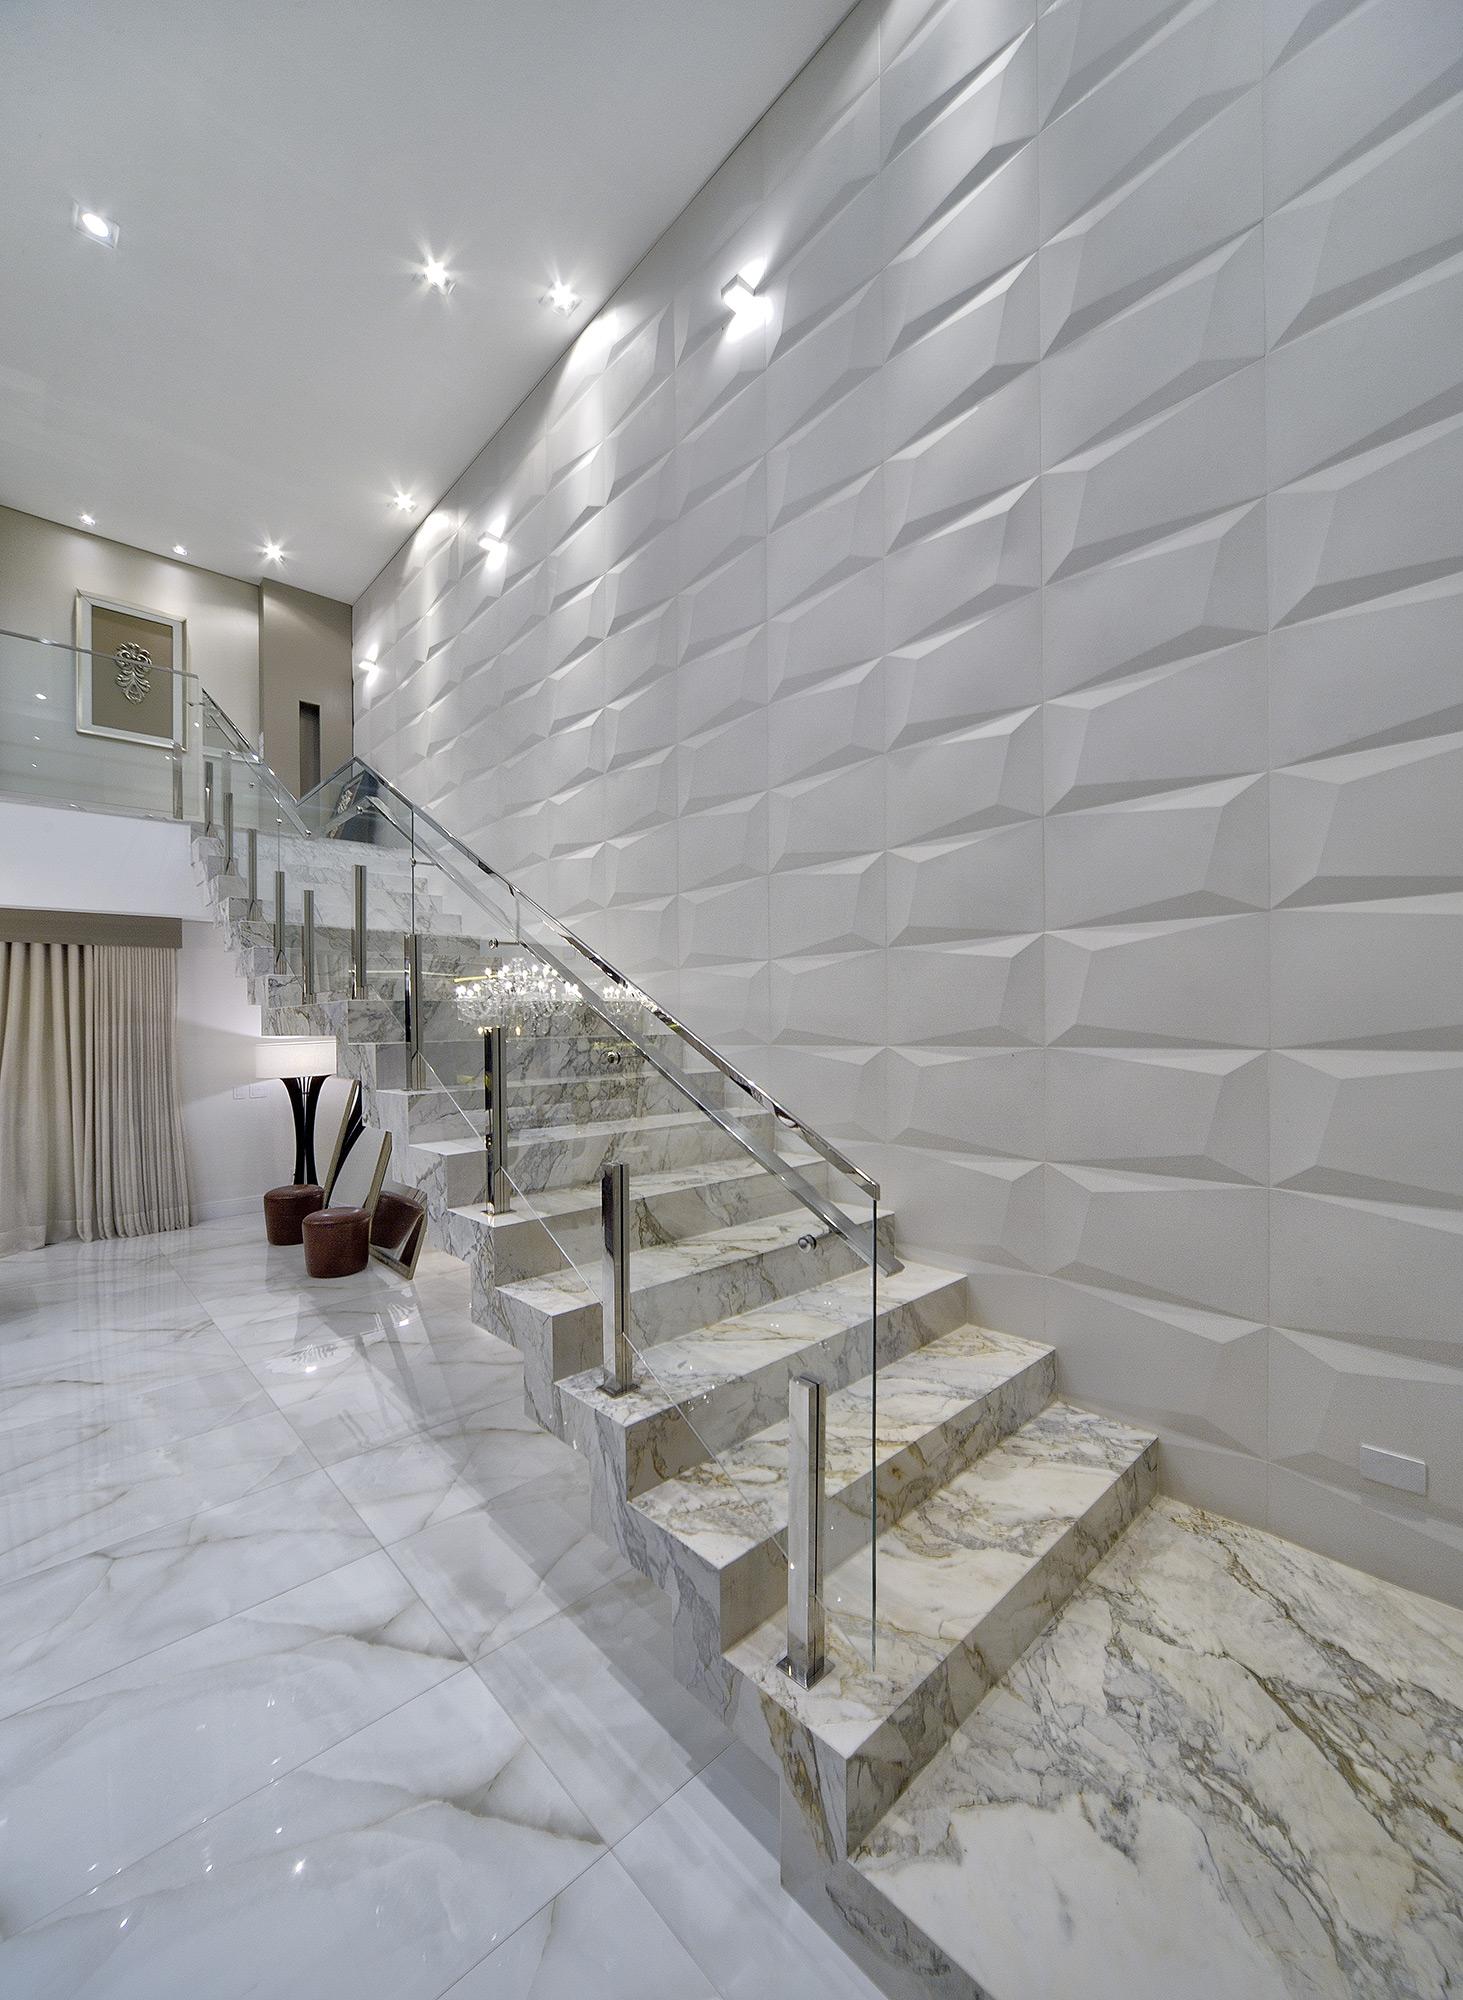 Prisma Paris Branco - Arquiteta Nathália Montans